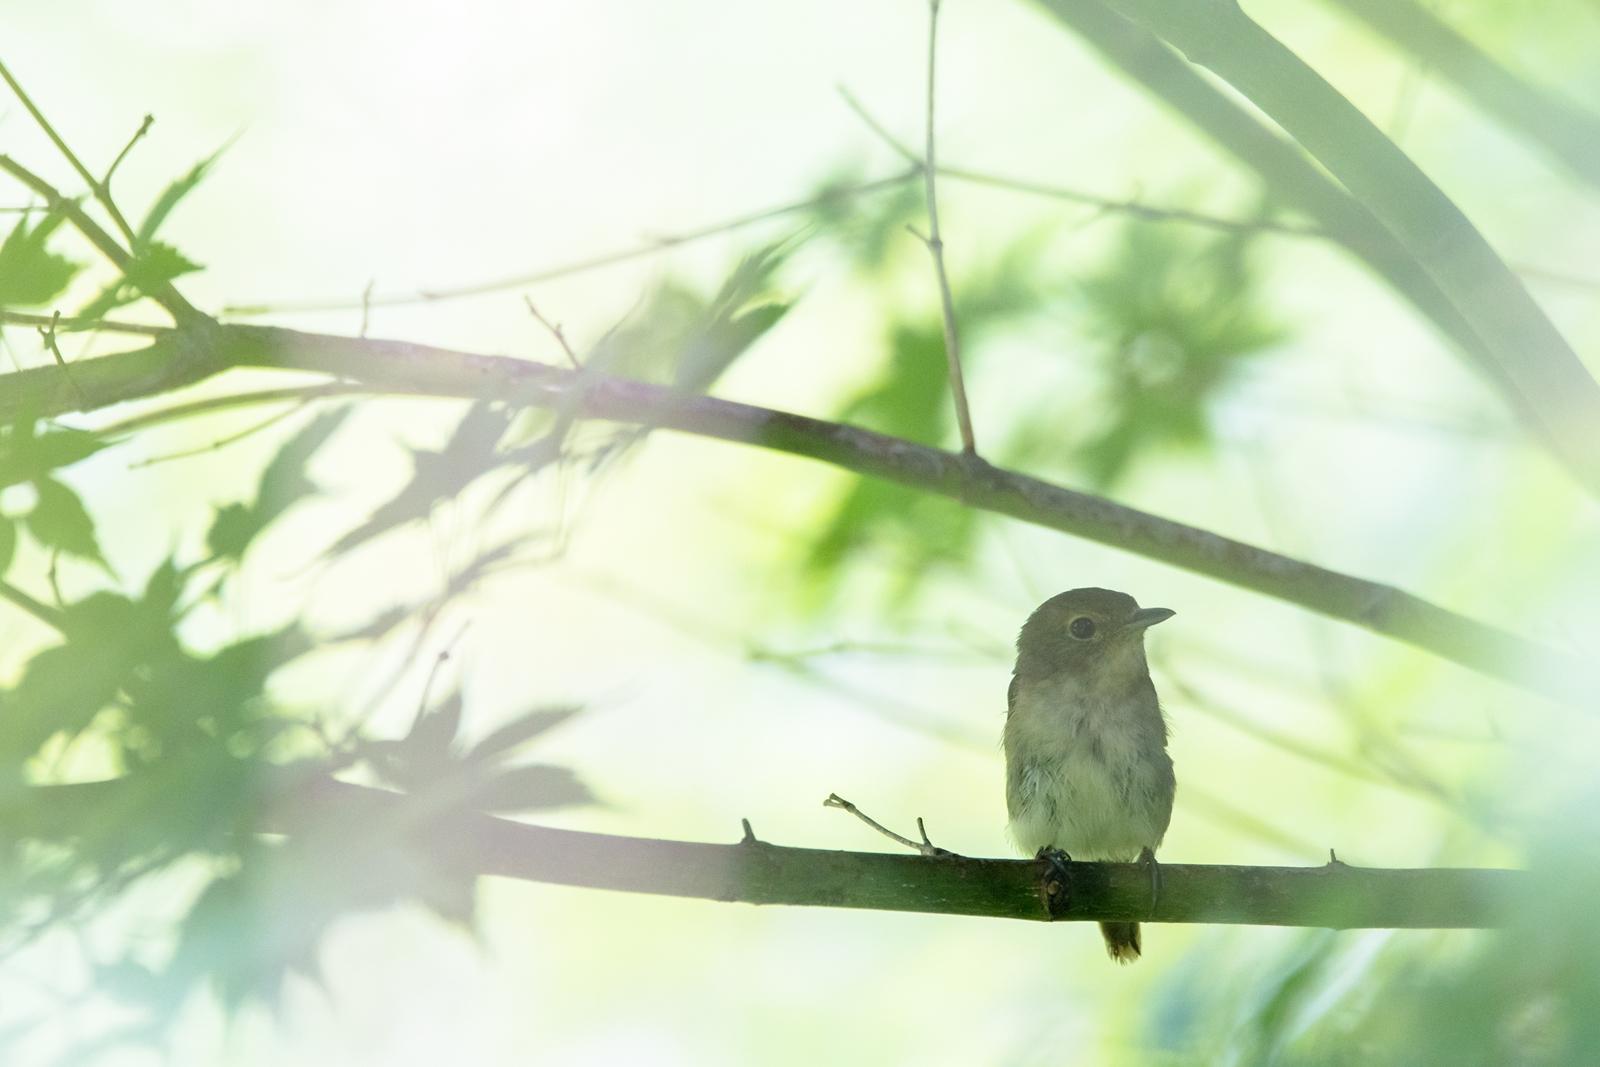 Photo: 「くつろぎの時間」 / Relax time.  緑に覆われた 安心な場所 くつろぐ君の姿が浮かぶ のんびりのんびり  I guess that's a female Narcissus Flycatcher. (キビタキ雌と推測)  Nikon D500 SIGMA 150-600mm F5-6.3 DG OS HSM Contemporary  #birdphotography #birds #kawaii #ことり #小鳥 #nikon #sigma  ( http://takafumiooshio.com/archives/2776 )